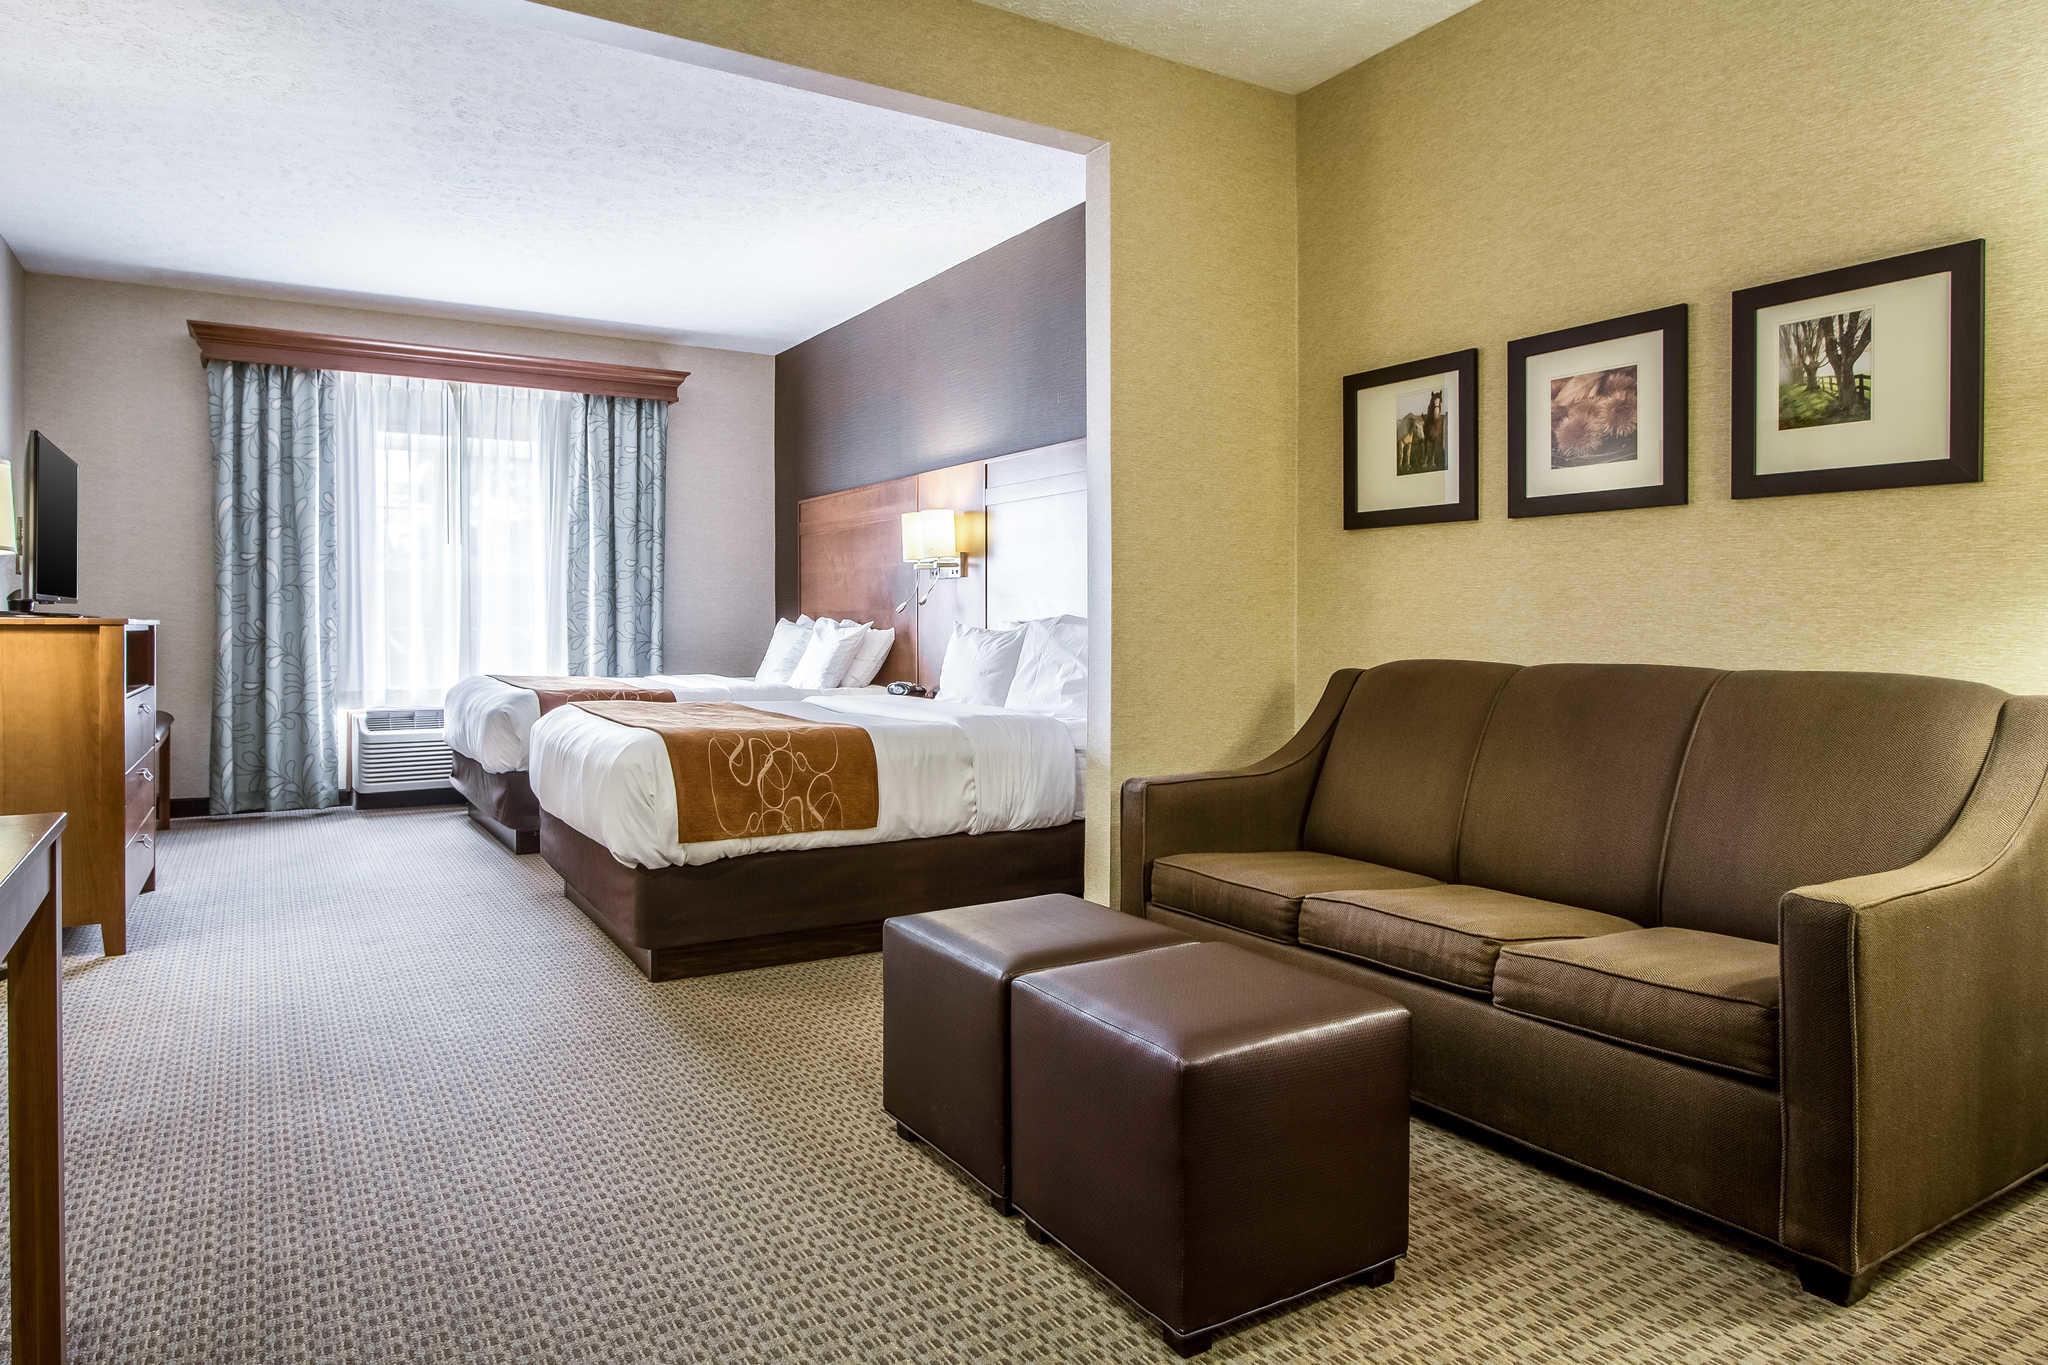 comfort berlin hotel us suites tr comforter oh three ohio booking hundred sixty six com